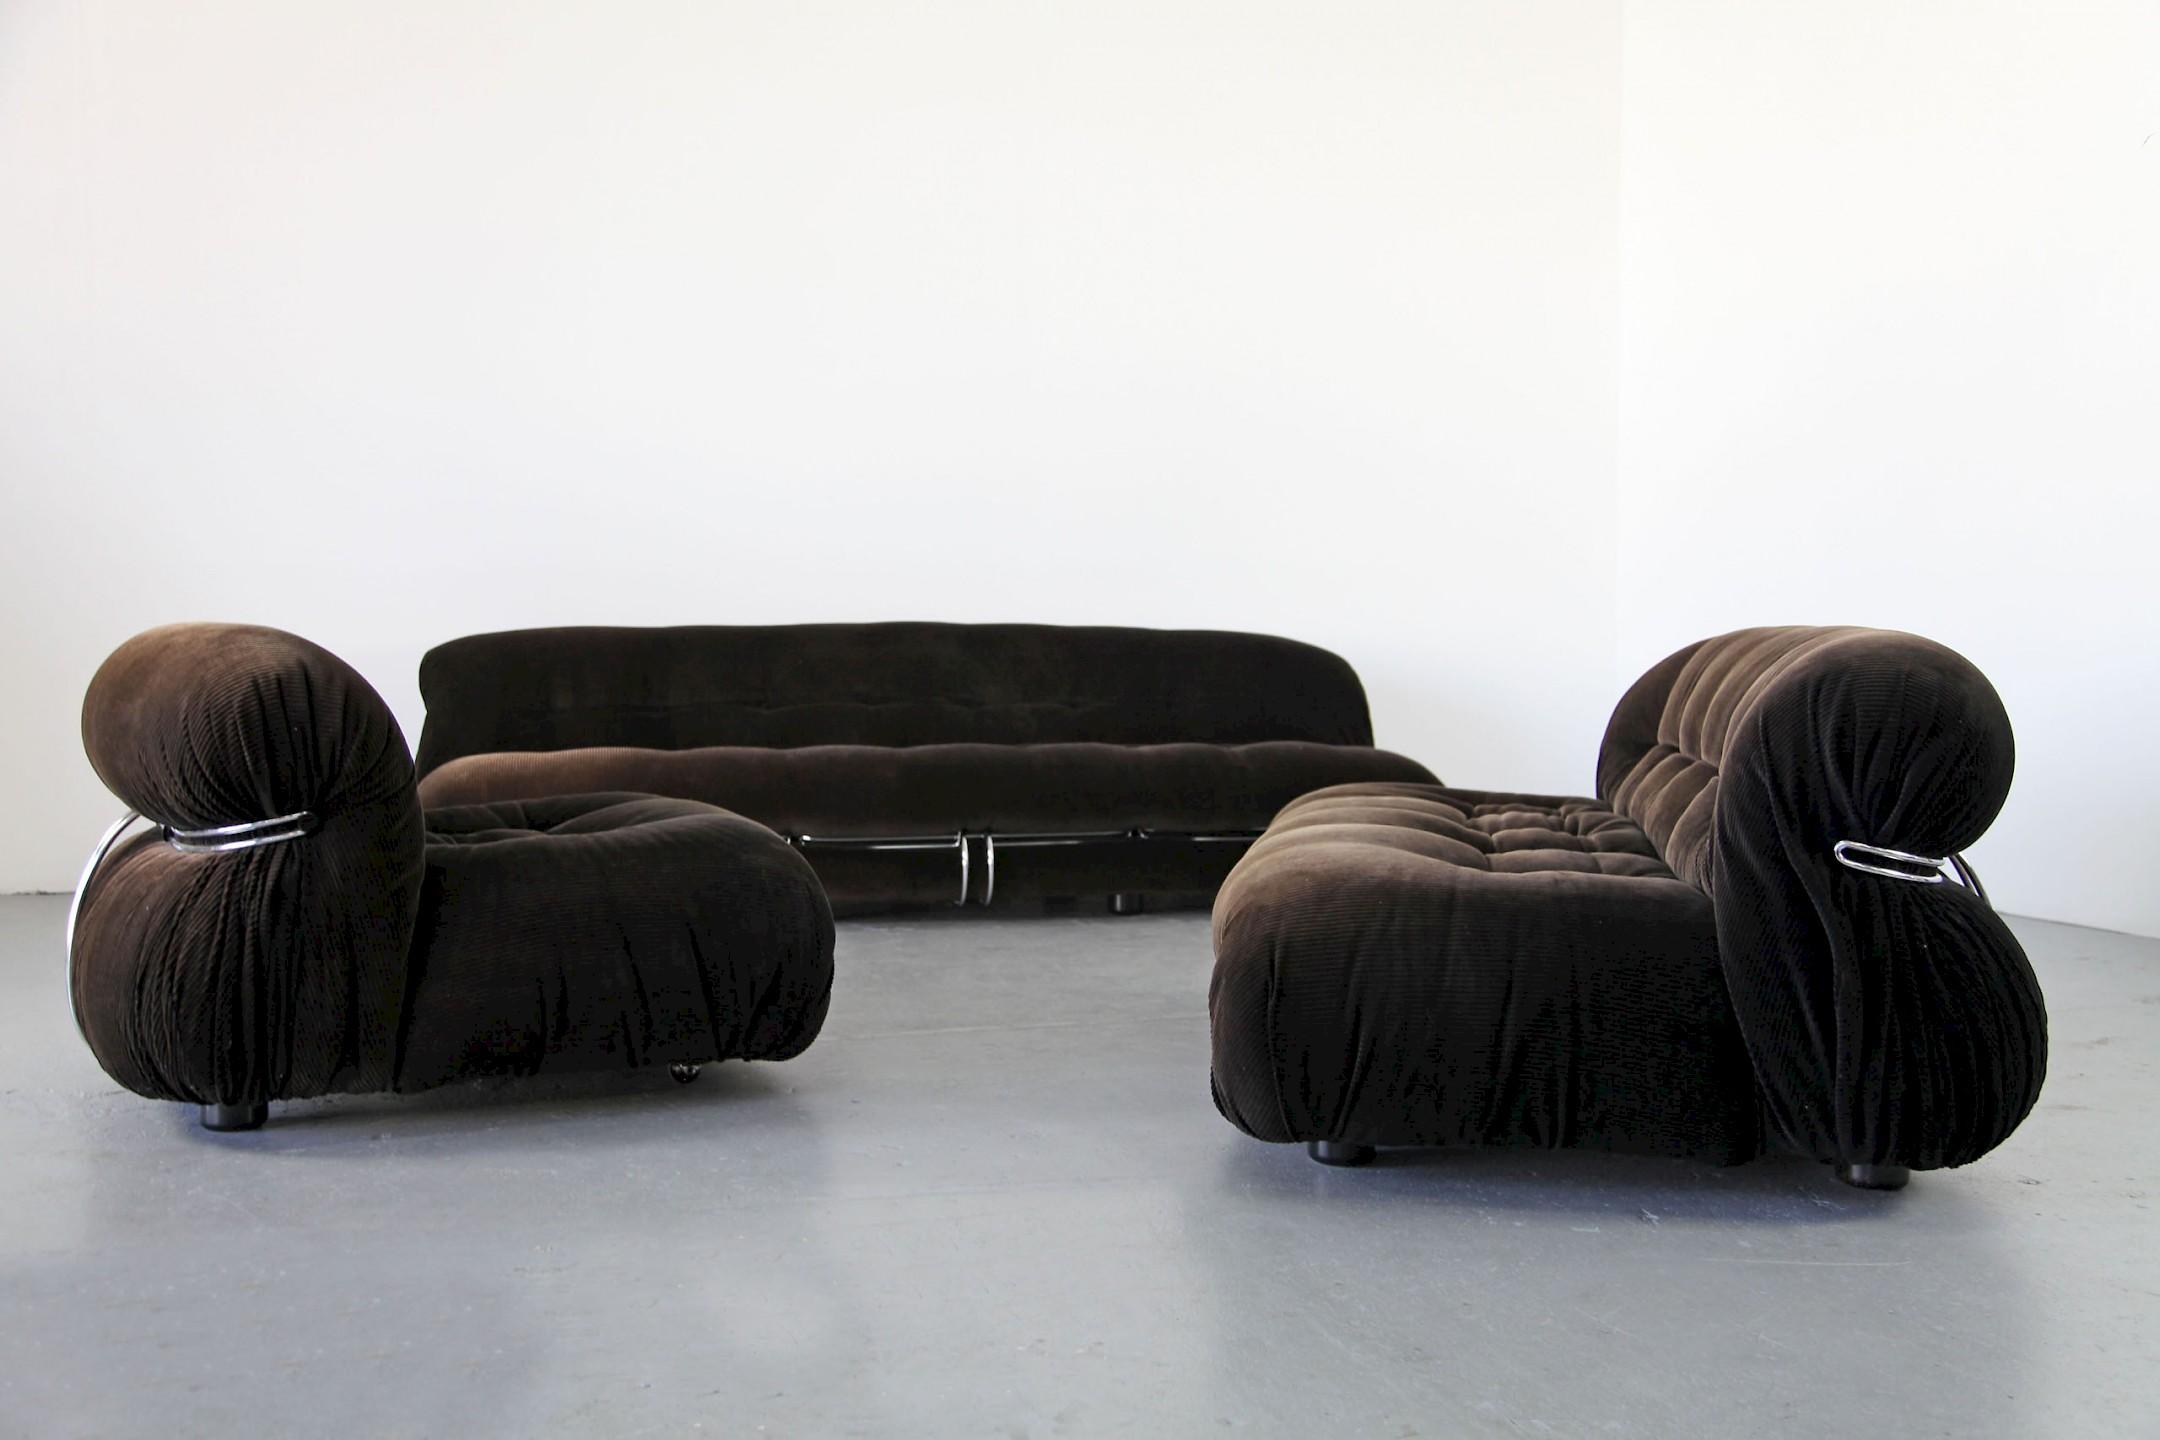 Soriana dreisitzer sofa von cassina italien adore modern for Cassina italy